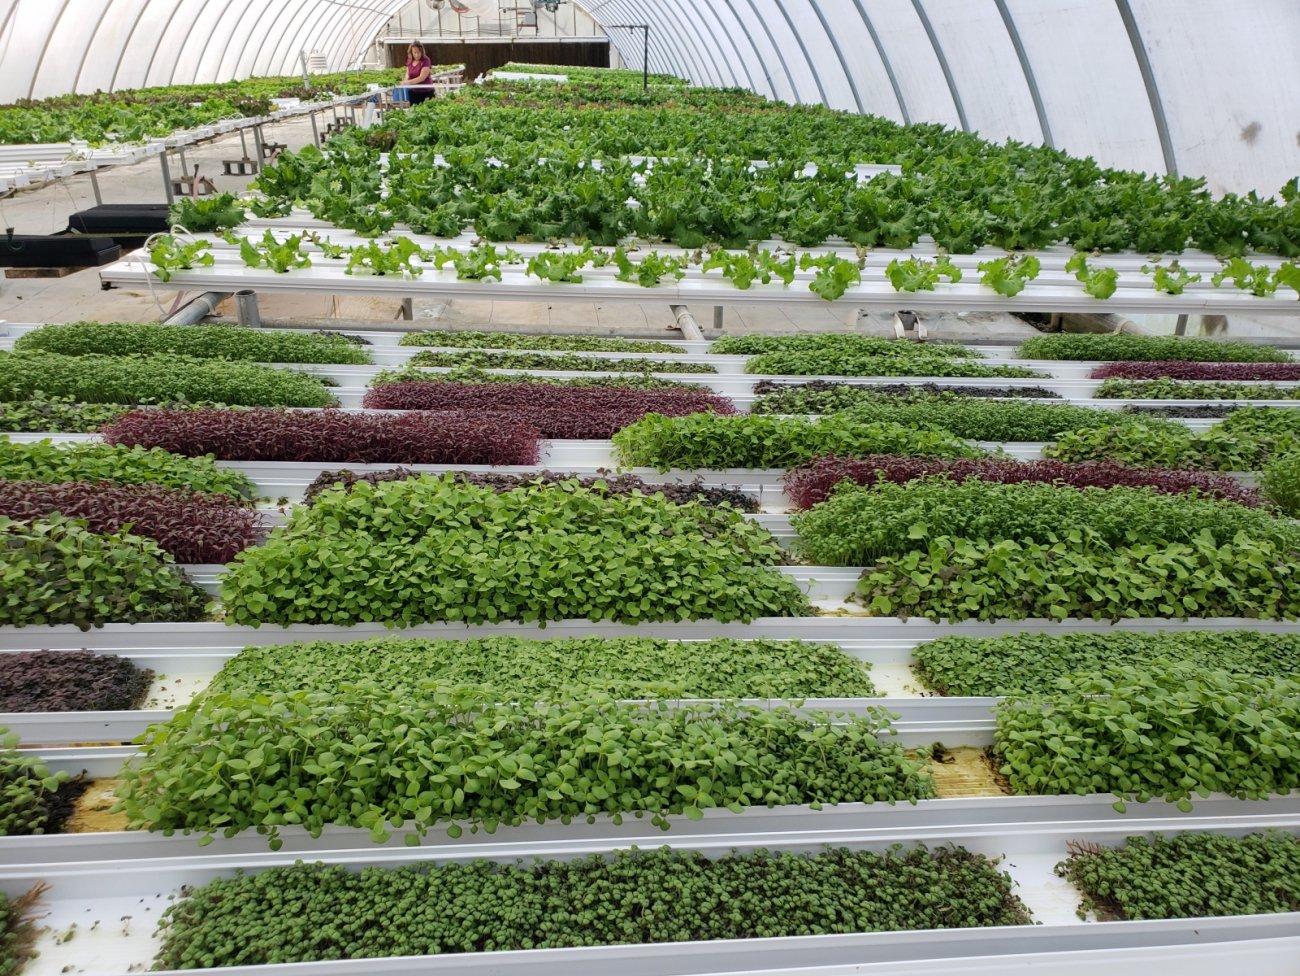 Hydroponics greenhouse at Farm Fresh Ventures